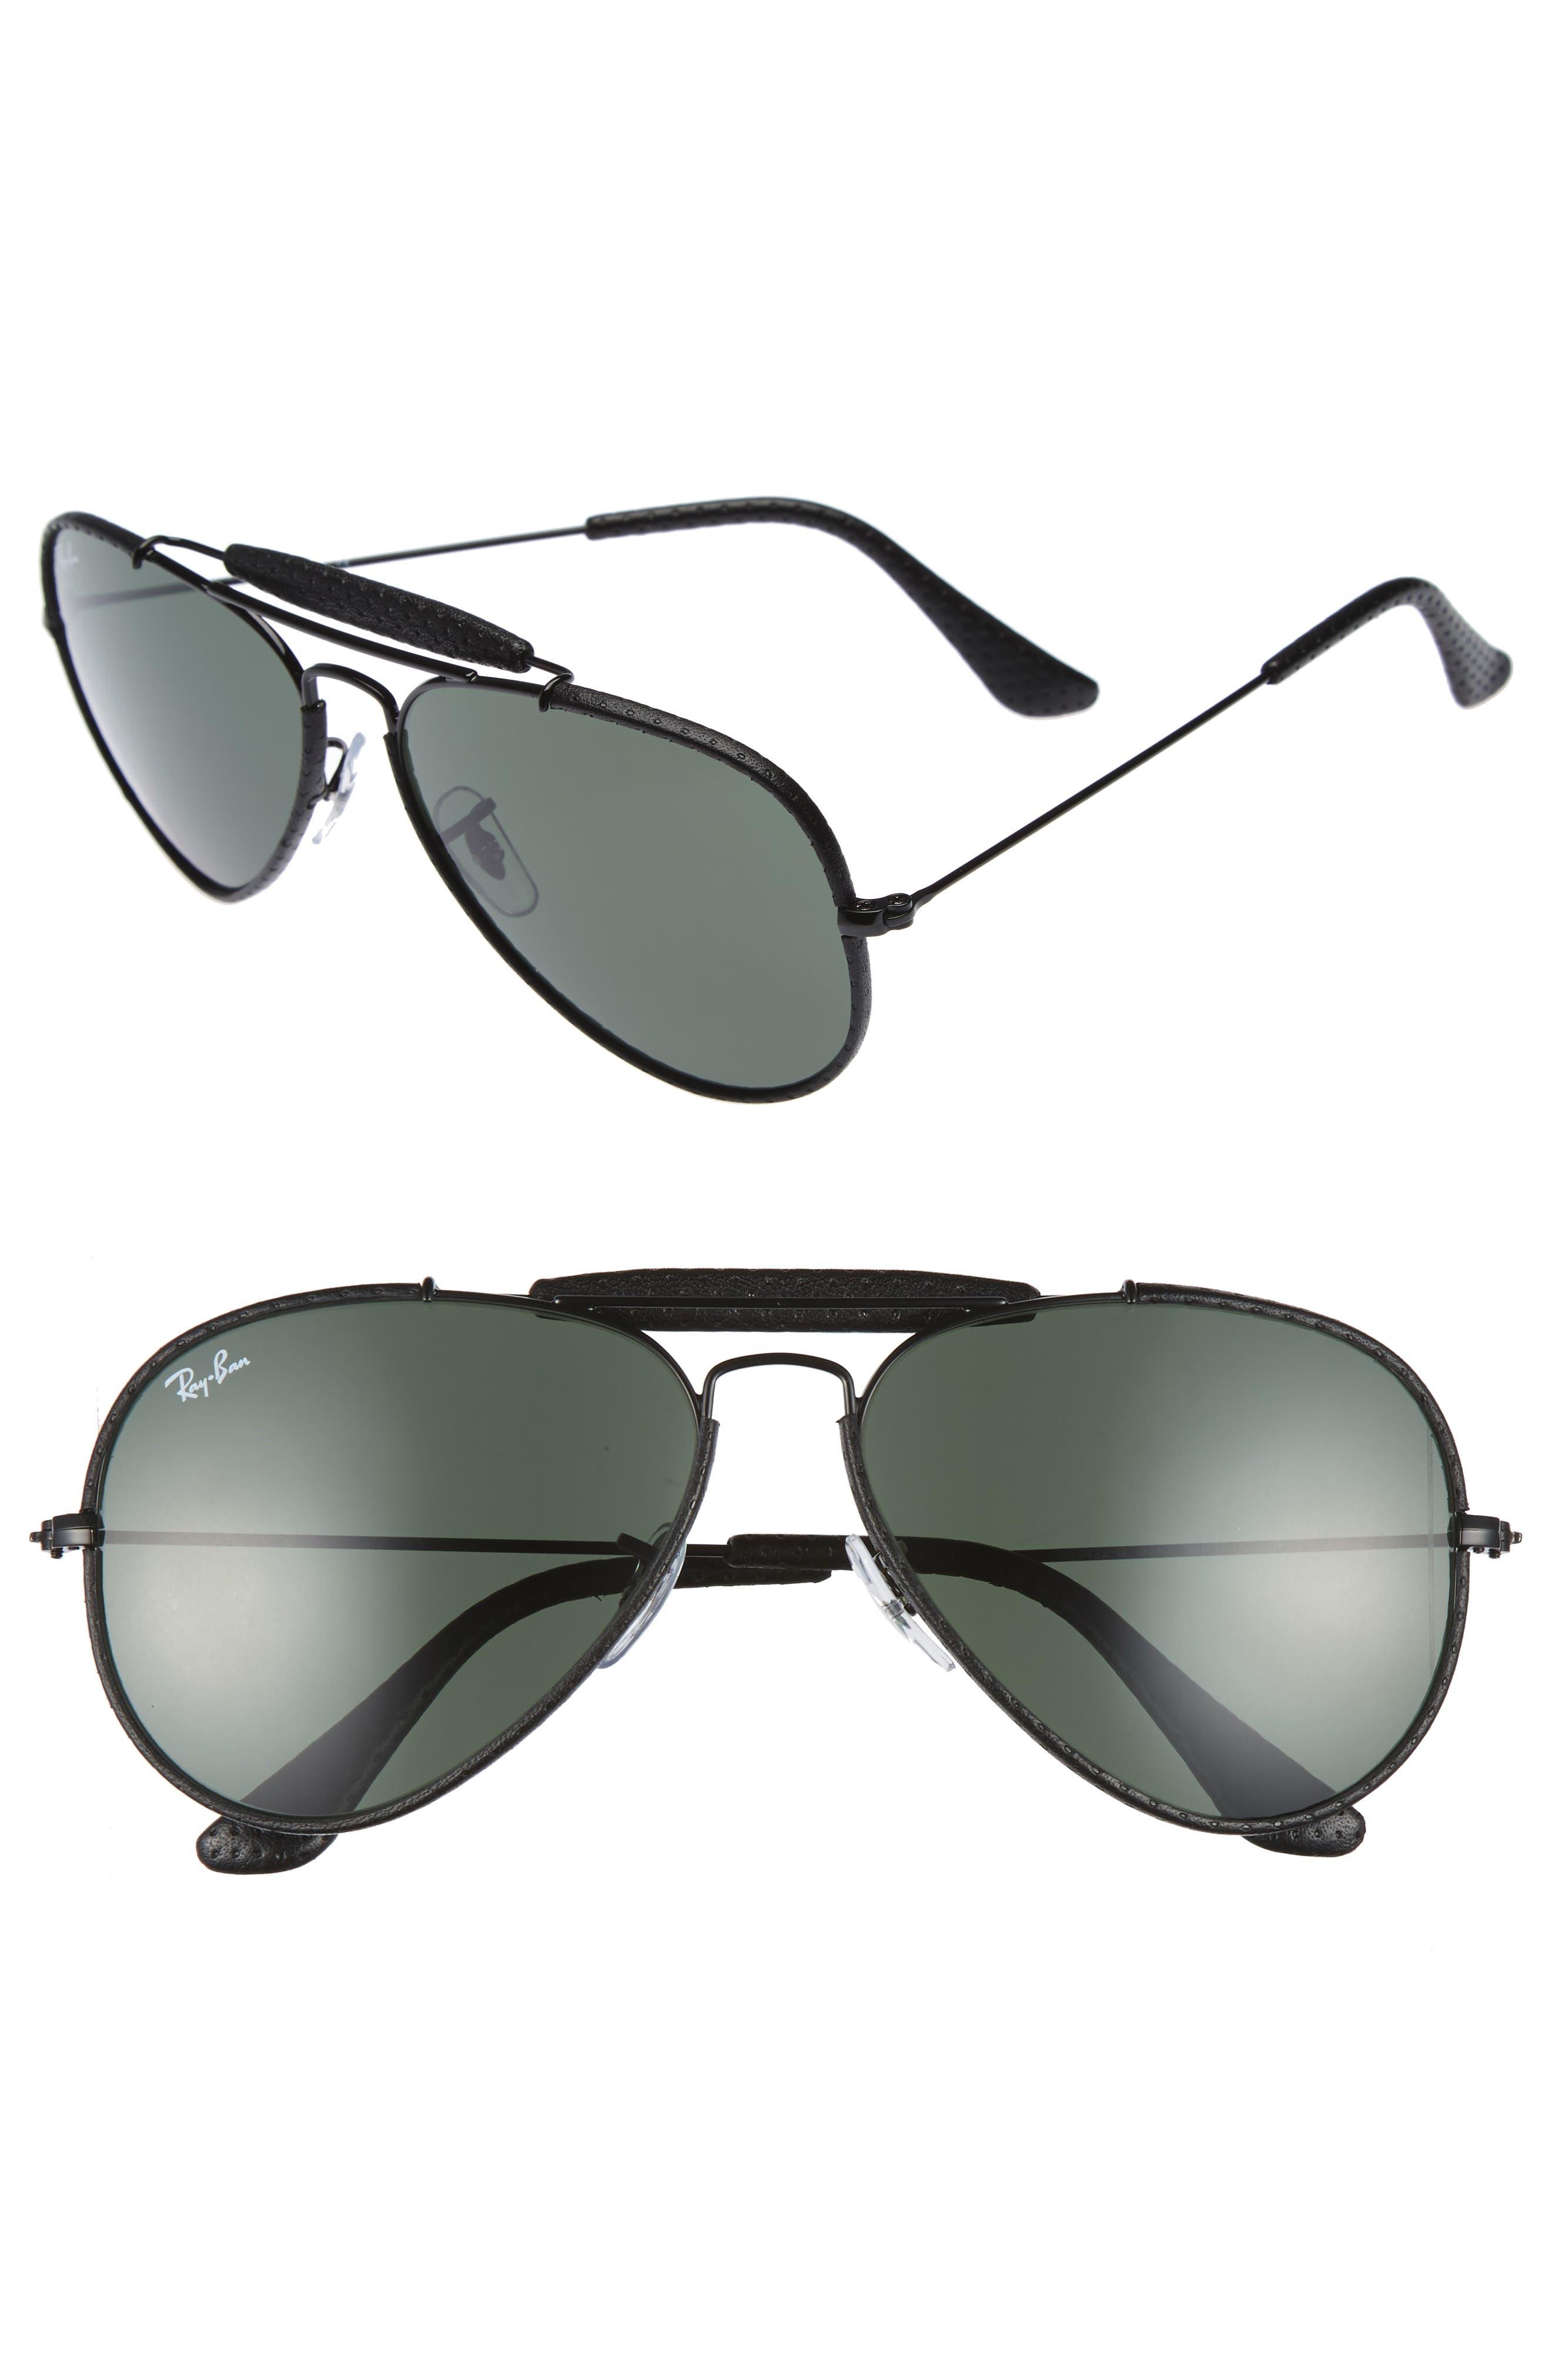 Main Image - Ray-Ban Outdoorsman 58mm Aviator Sunglasses